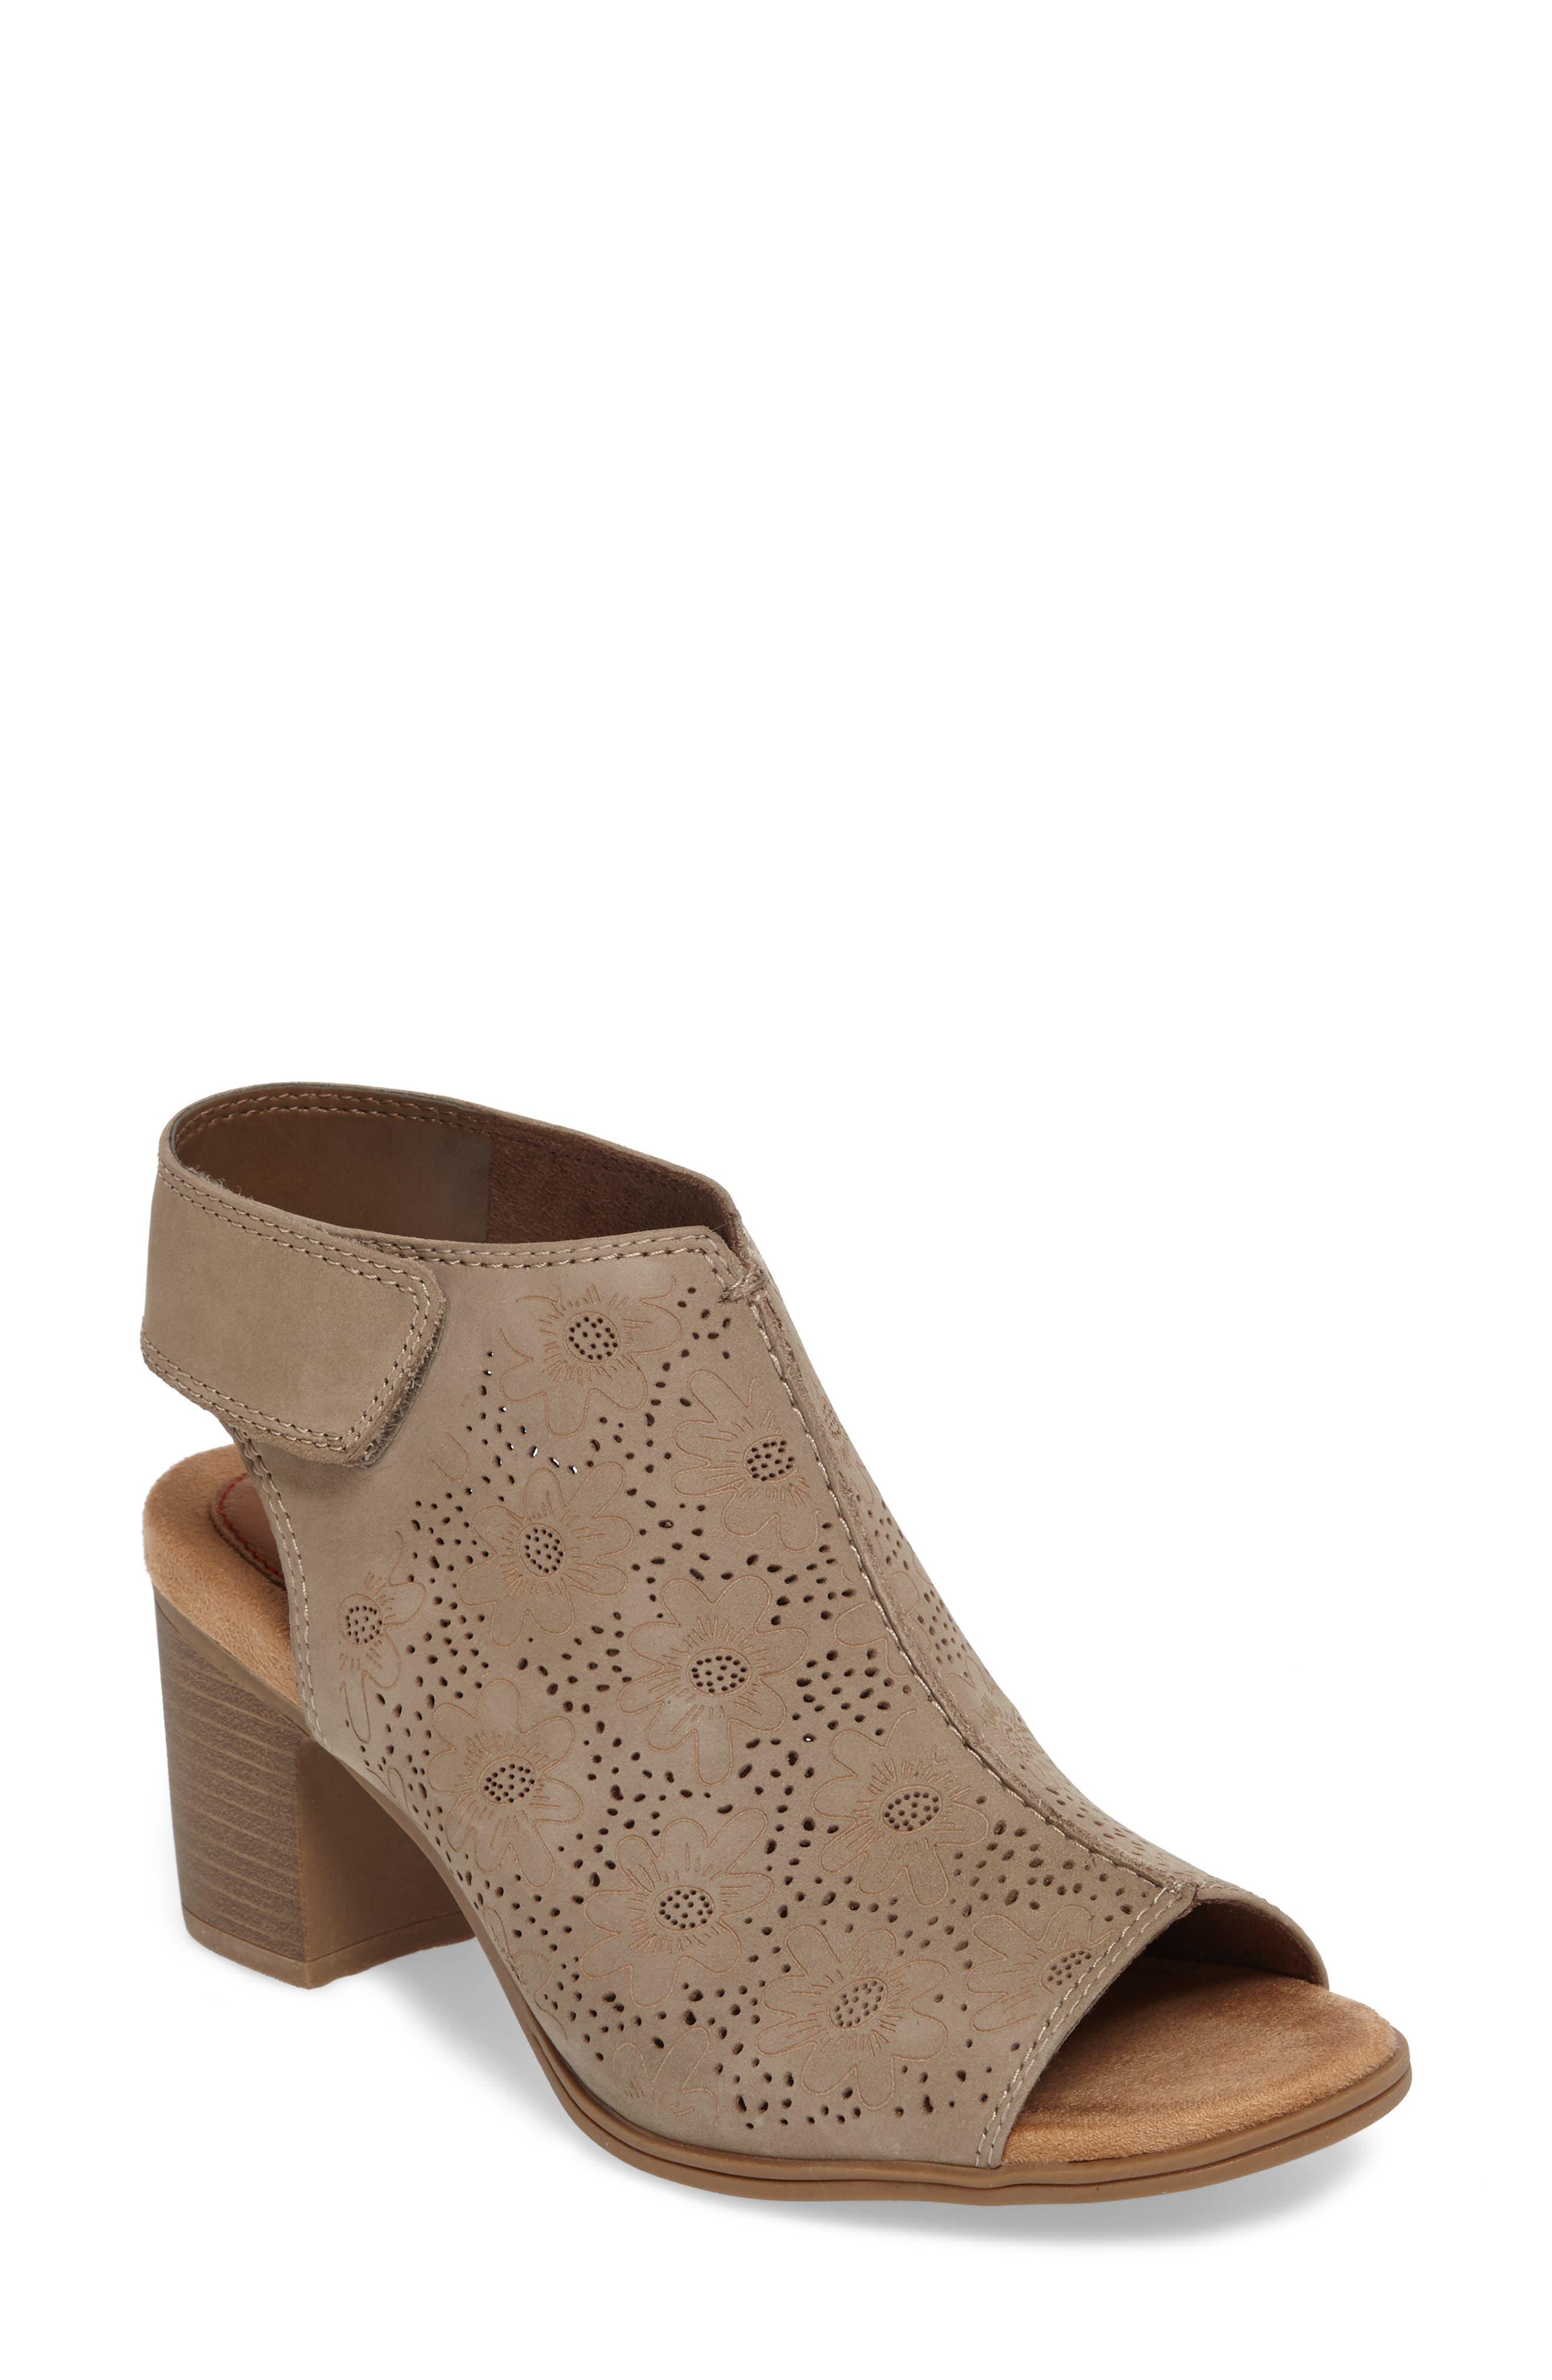 Hattie Perforated Slingback Sandal,                         Main,                         color, KHAKI NUBUCK